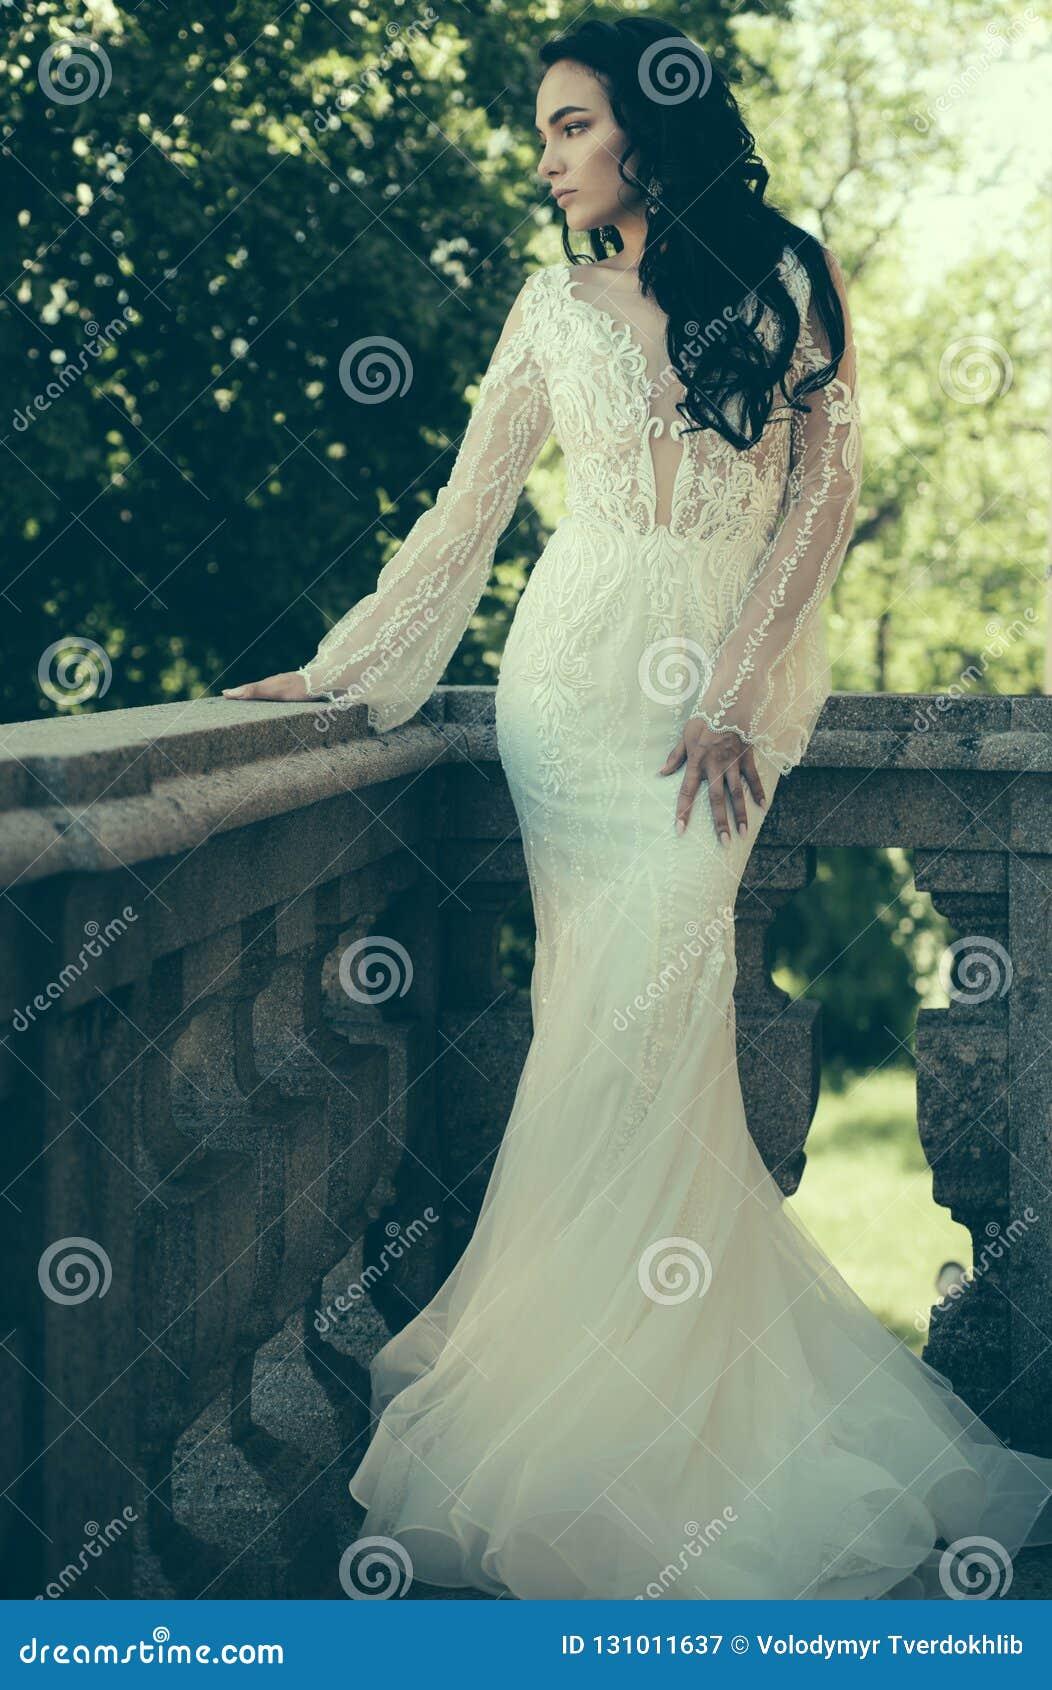 Woman is preparing for wedding. Happy bride before wedding. Wonderful bridal gown. Beautiful wedding dresses in boutique